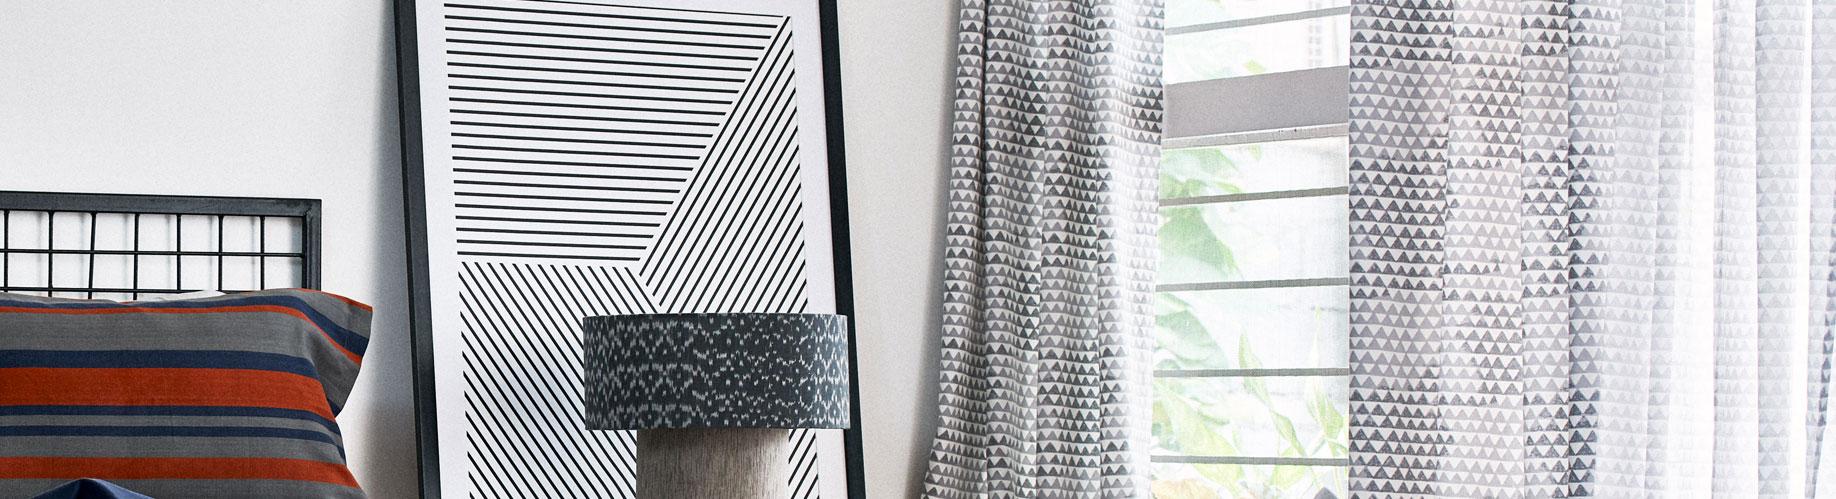 Customizable Cotton Curtains